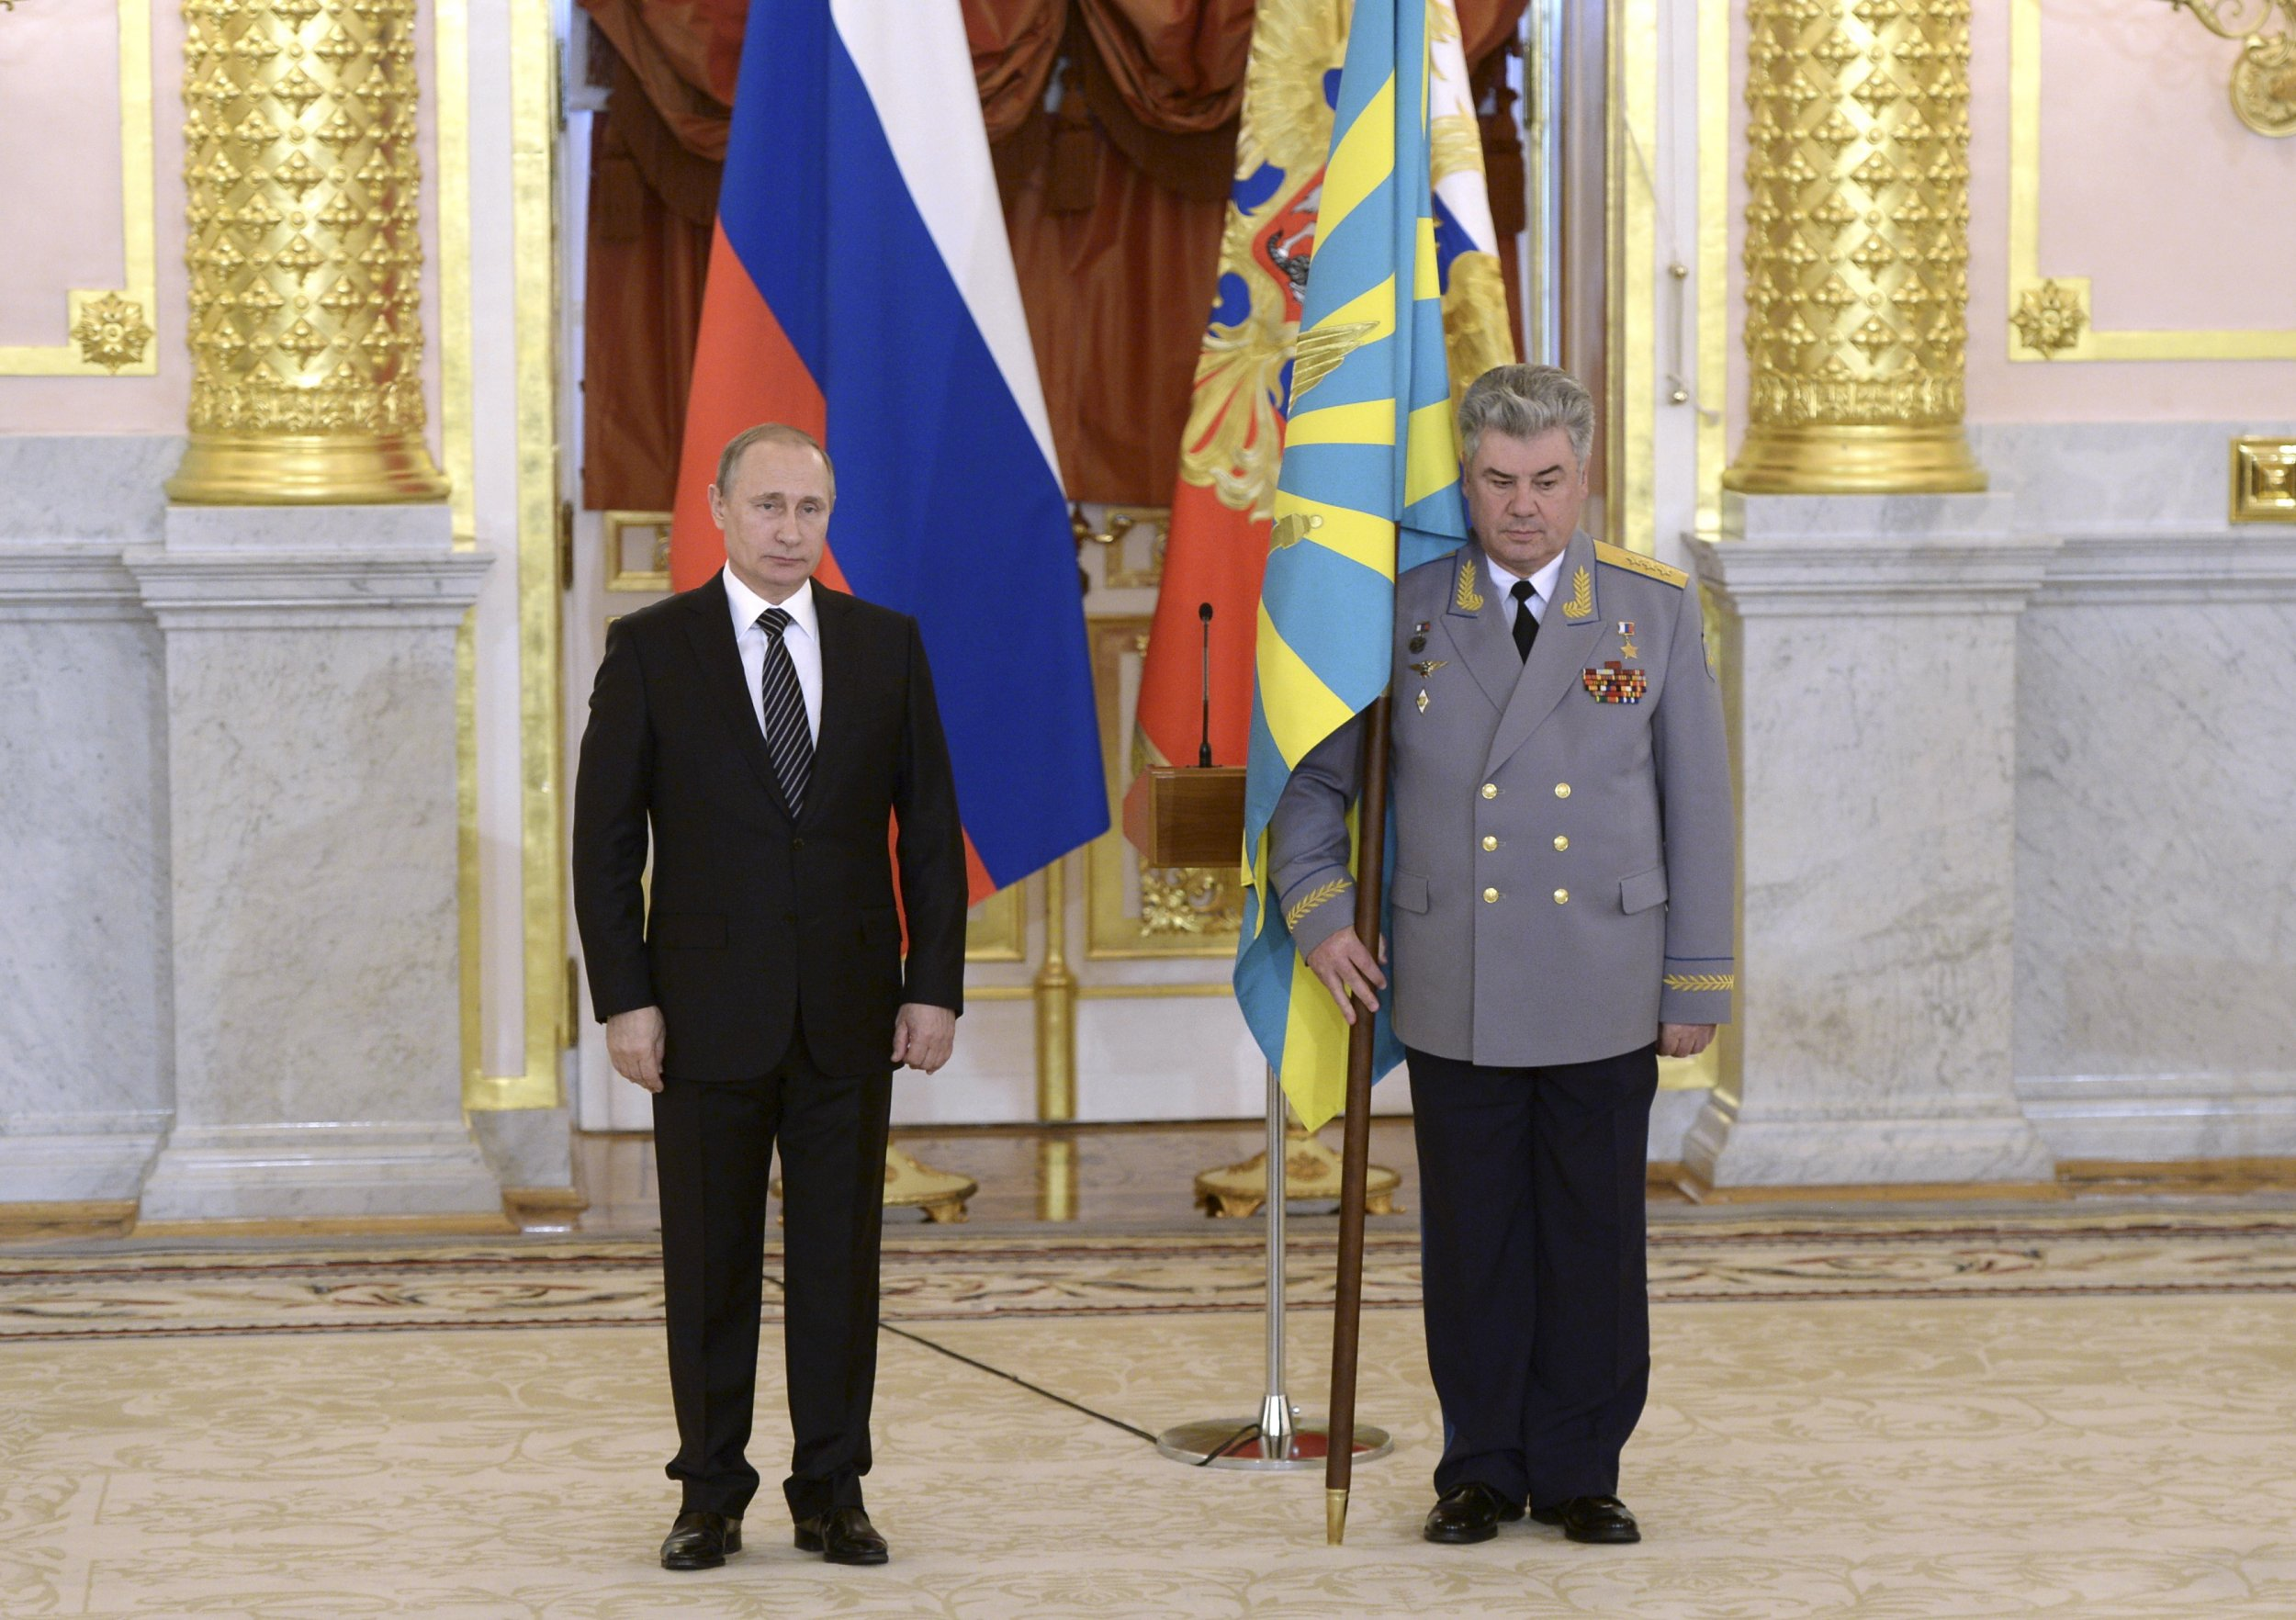 Putin at air force ceremony